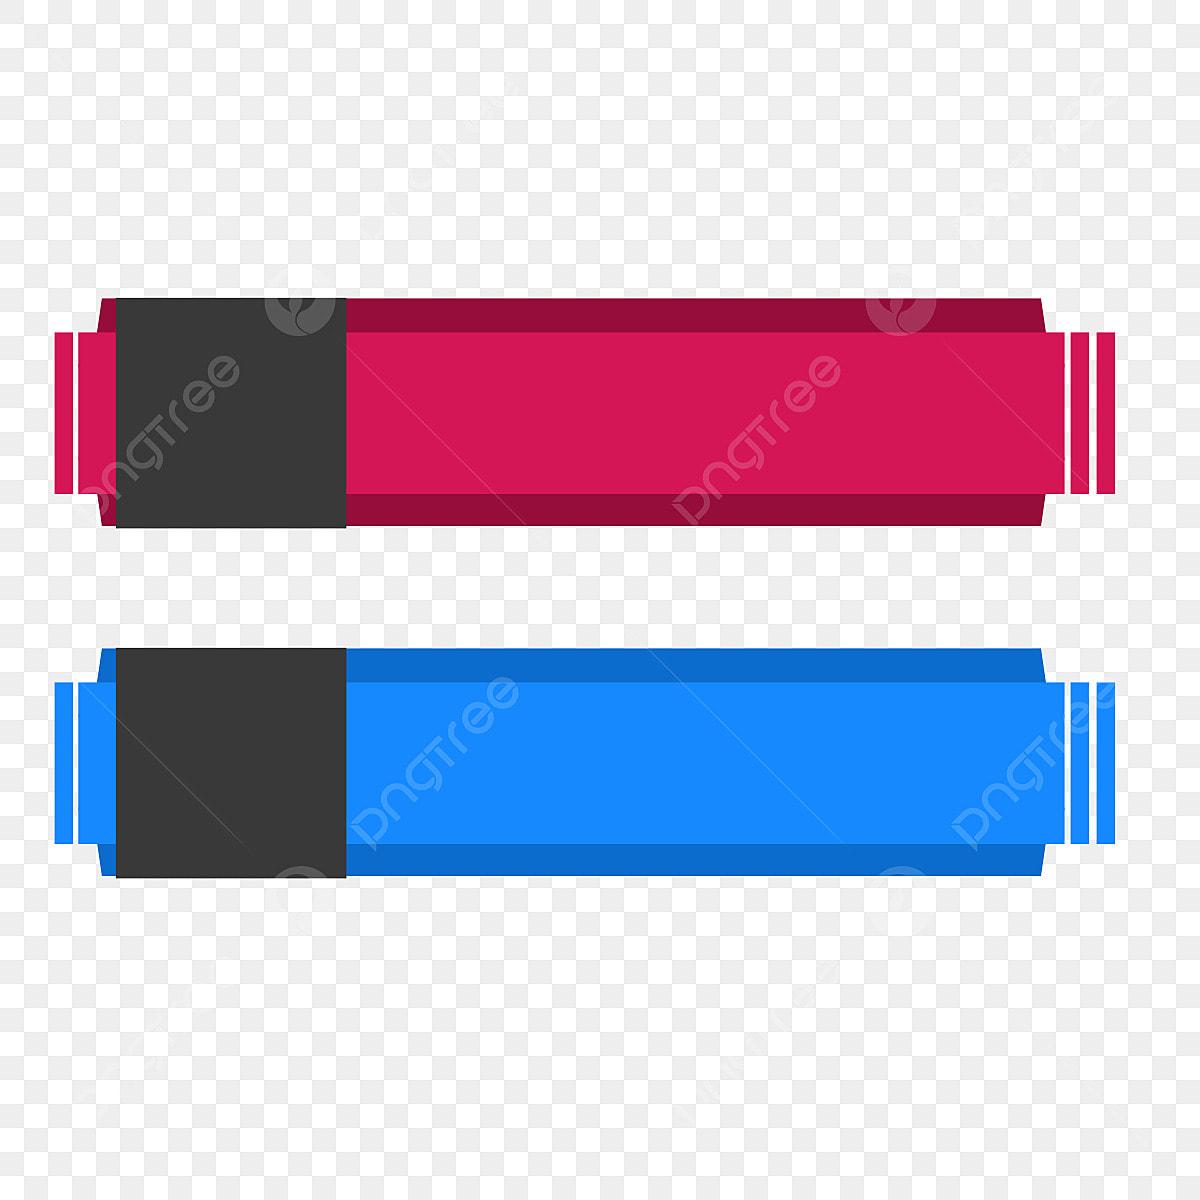 Creative Free Lower Third Graphics Psd, Free Lower, Third, Graphics